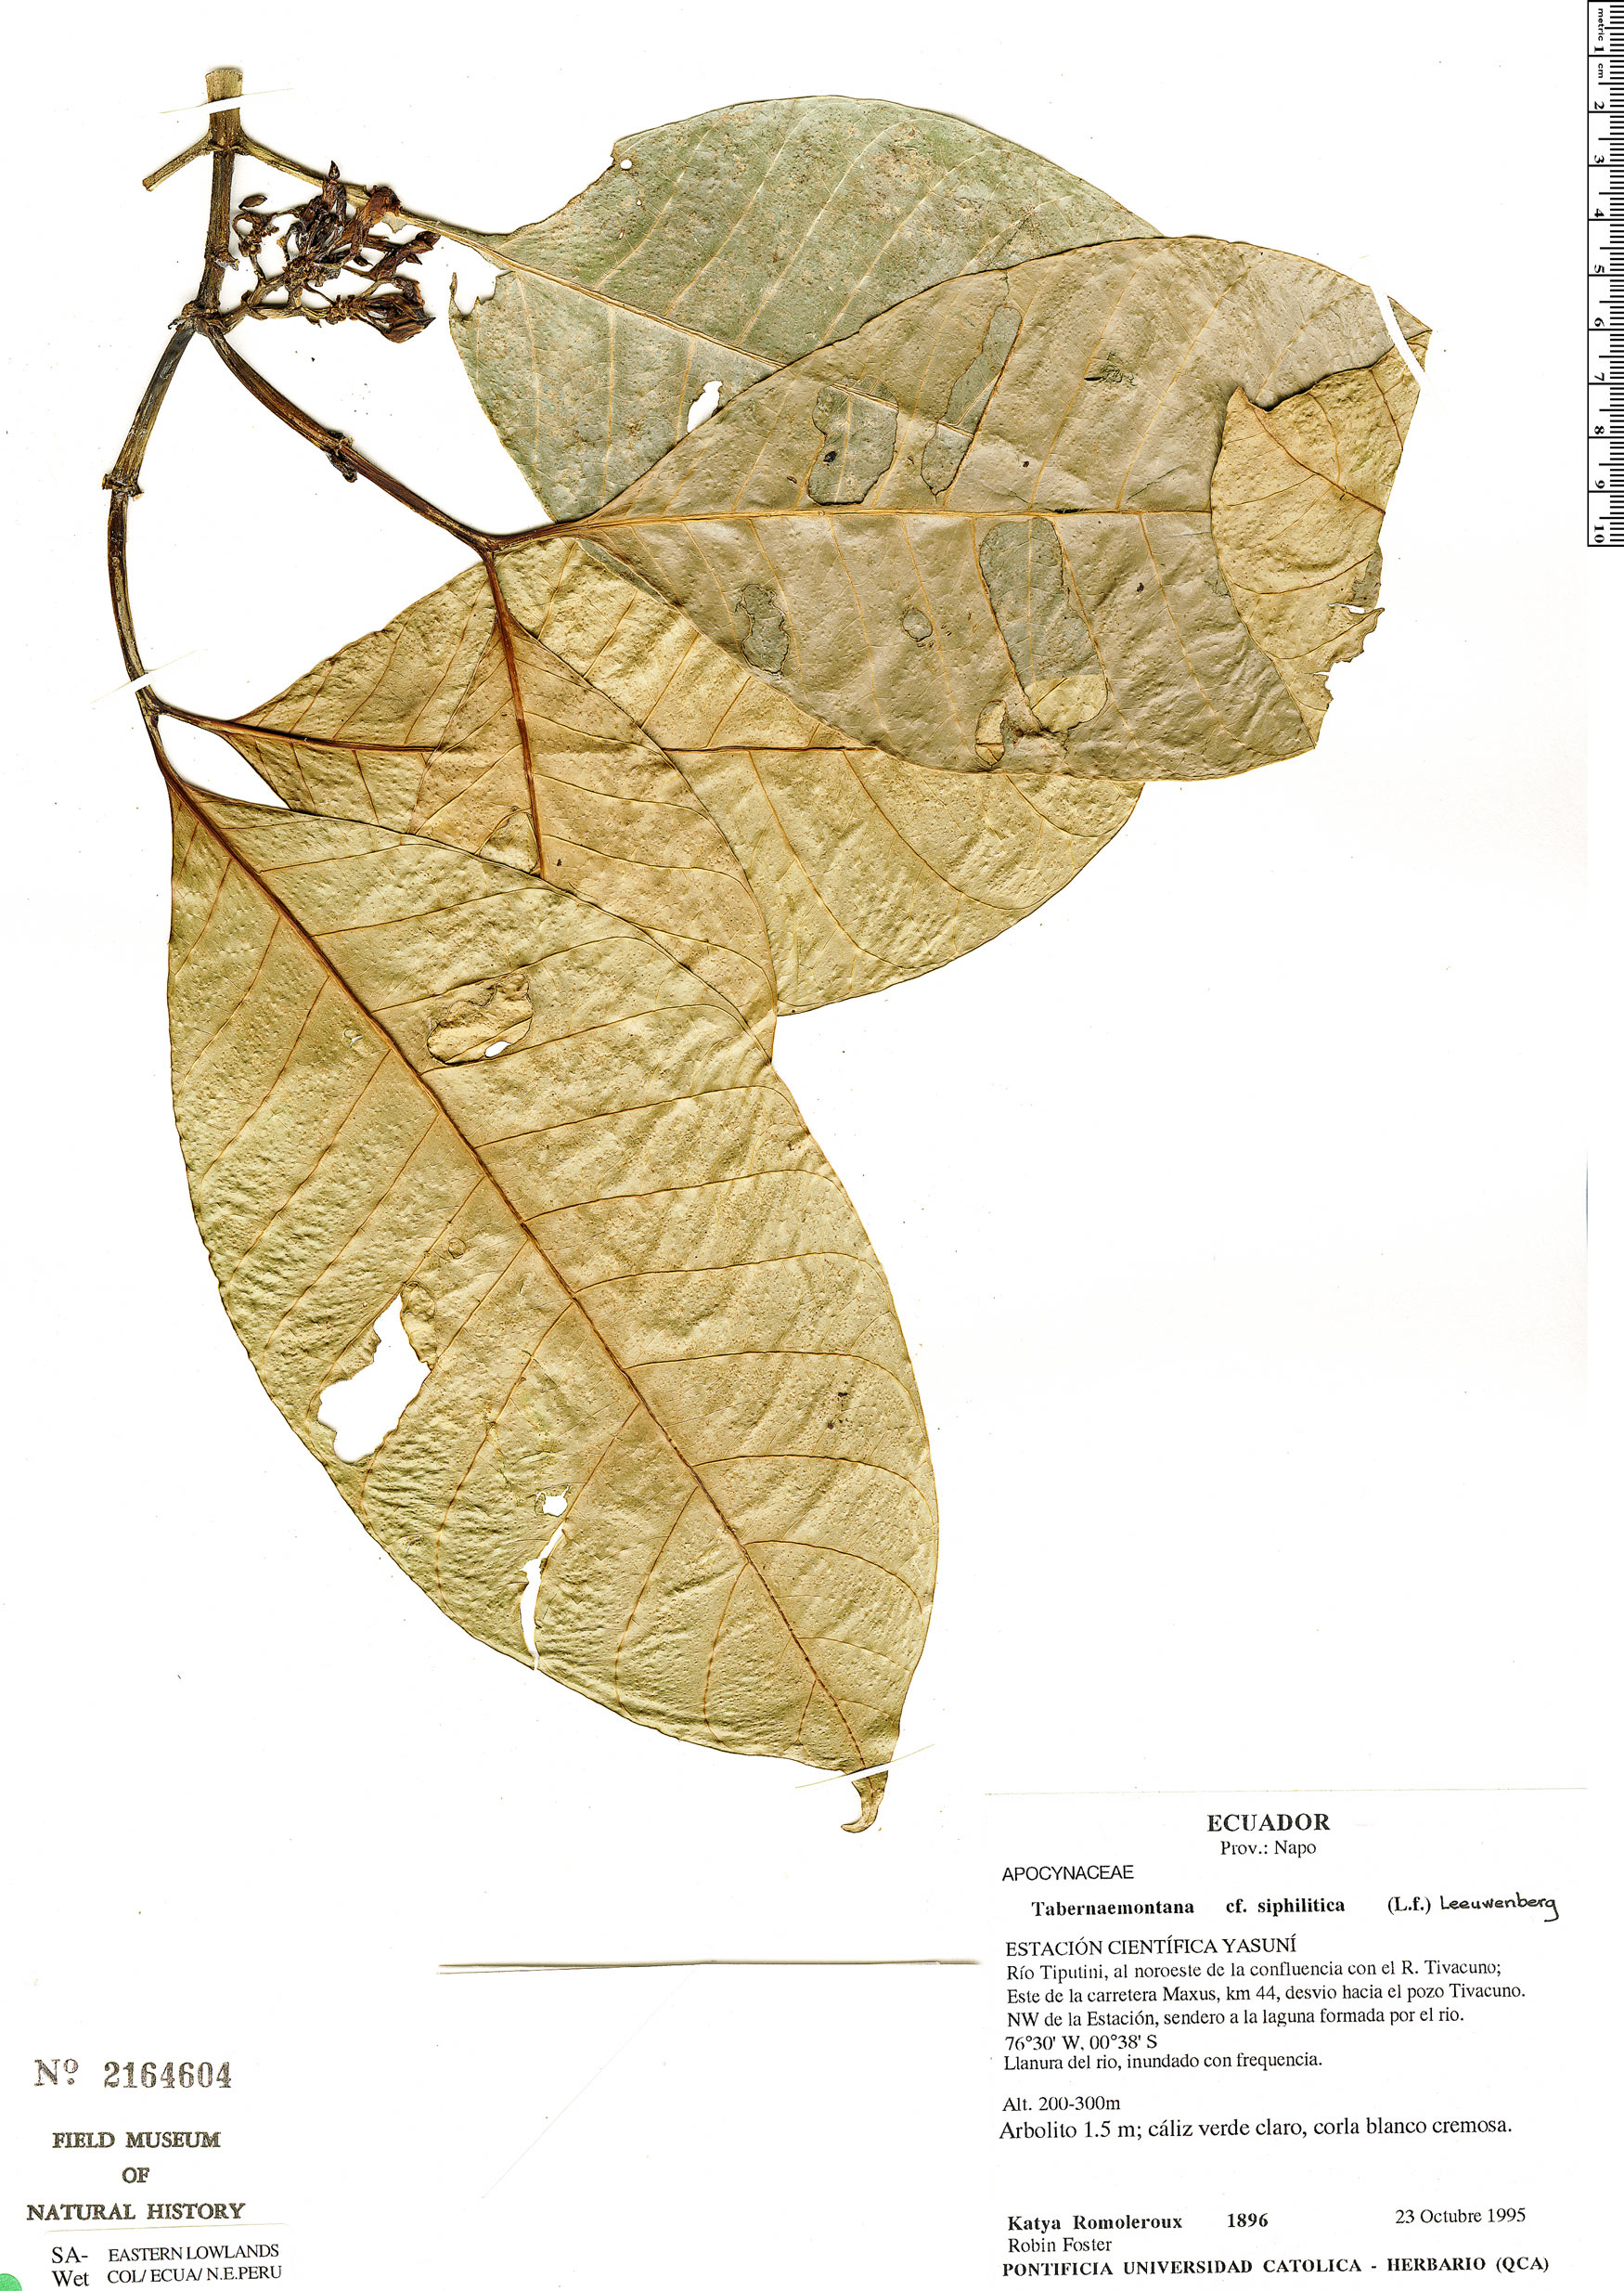 Espécimen: Tabernaemontana siphilitica